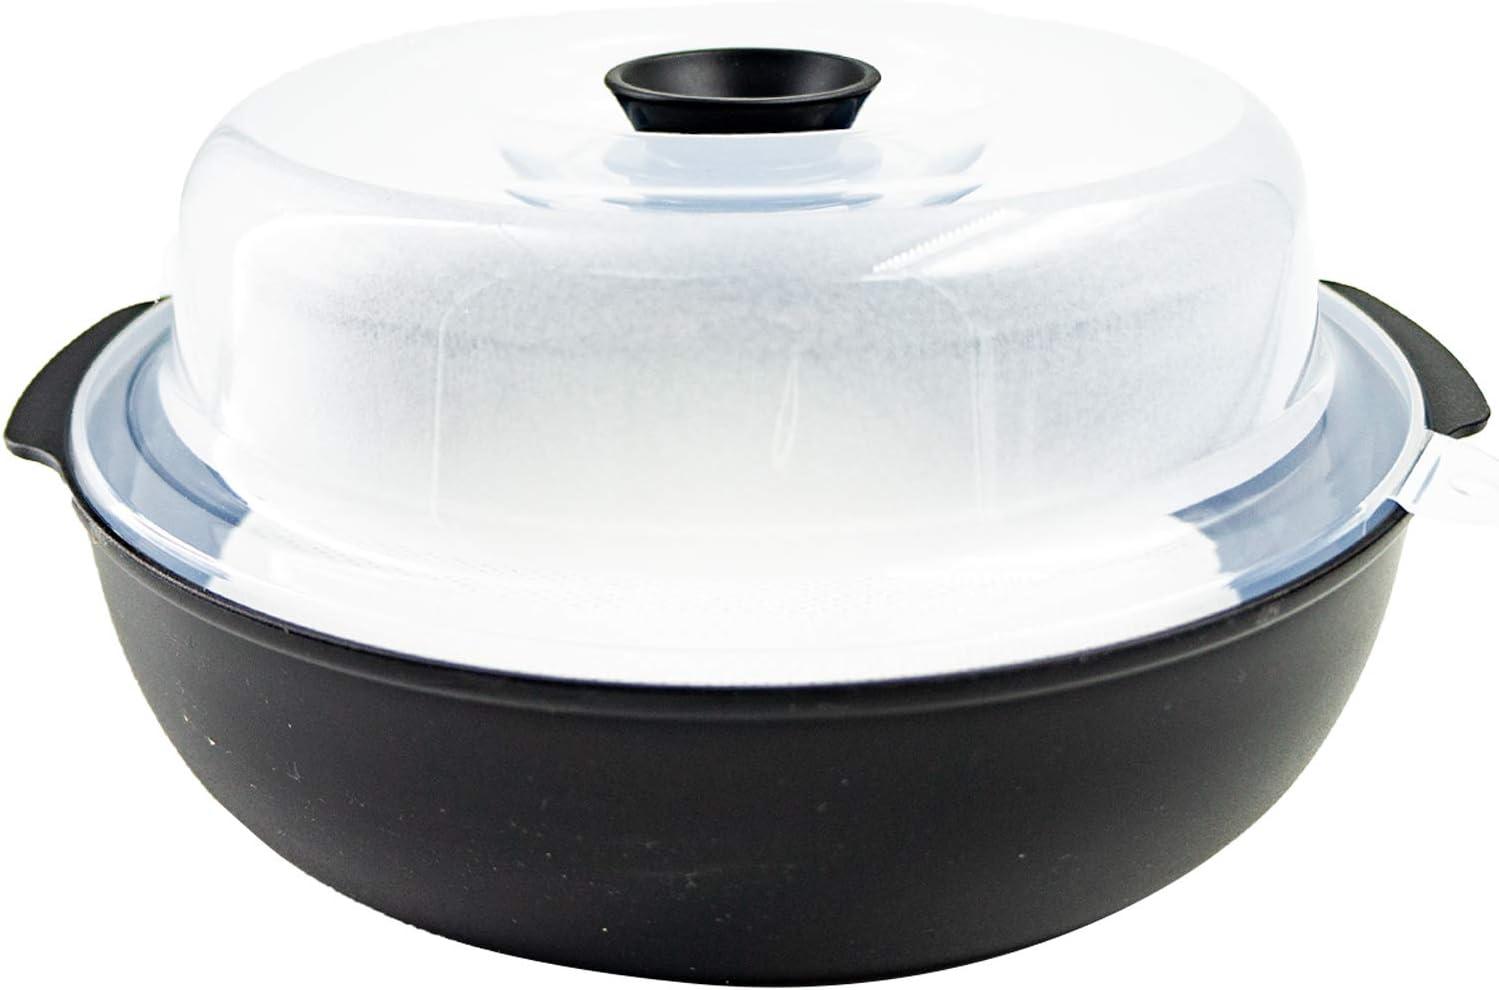 microwave steamer pot, Cookware Steamer, BPA Free, Fridge and Freezer Safe, 2.6L, 10.3